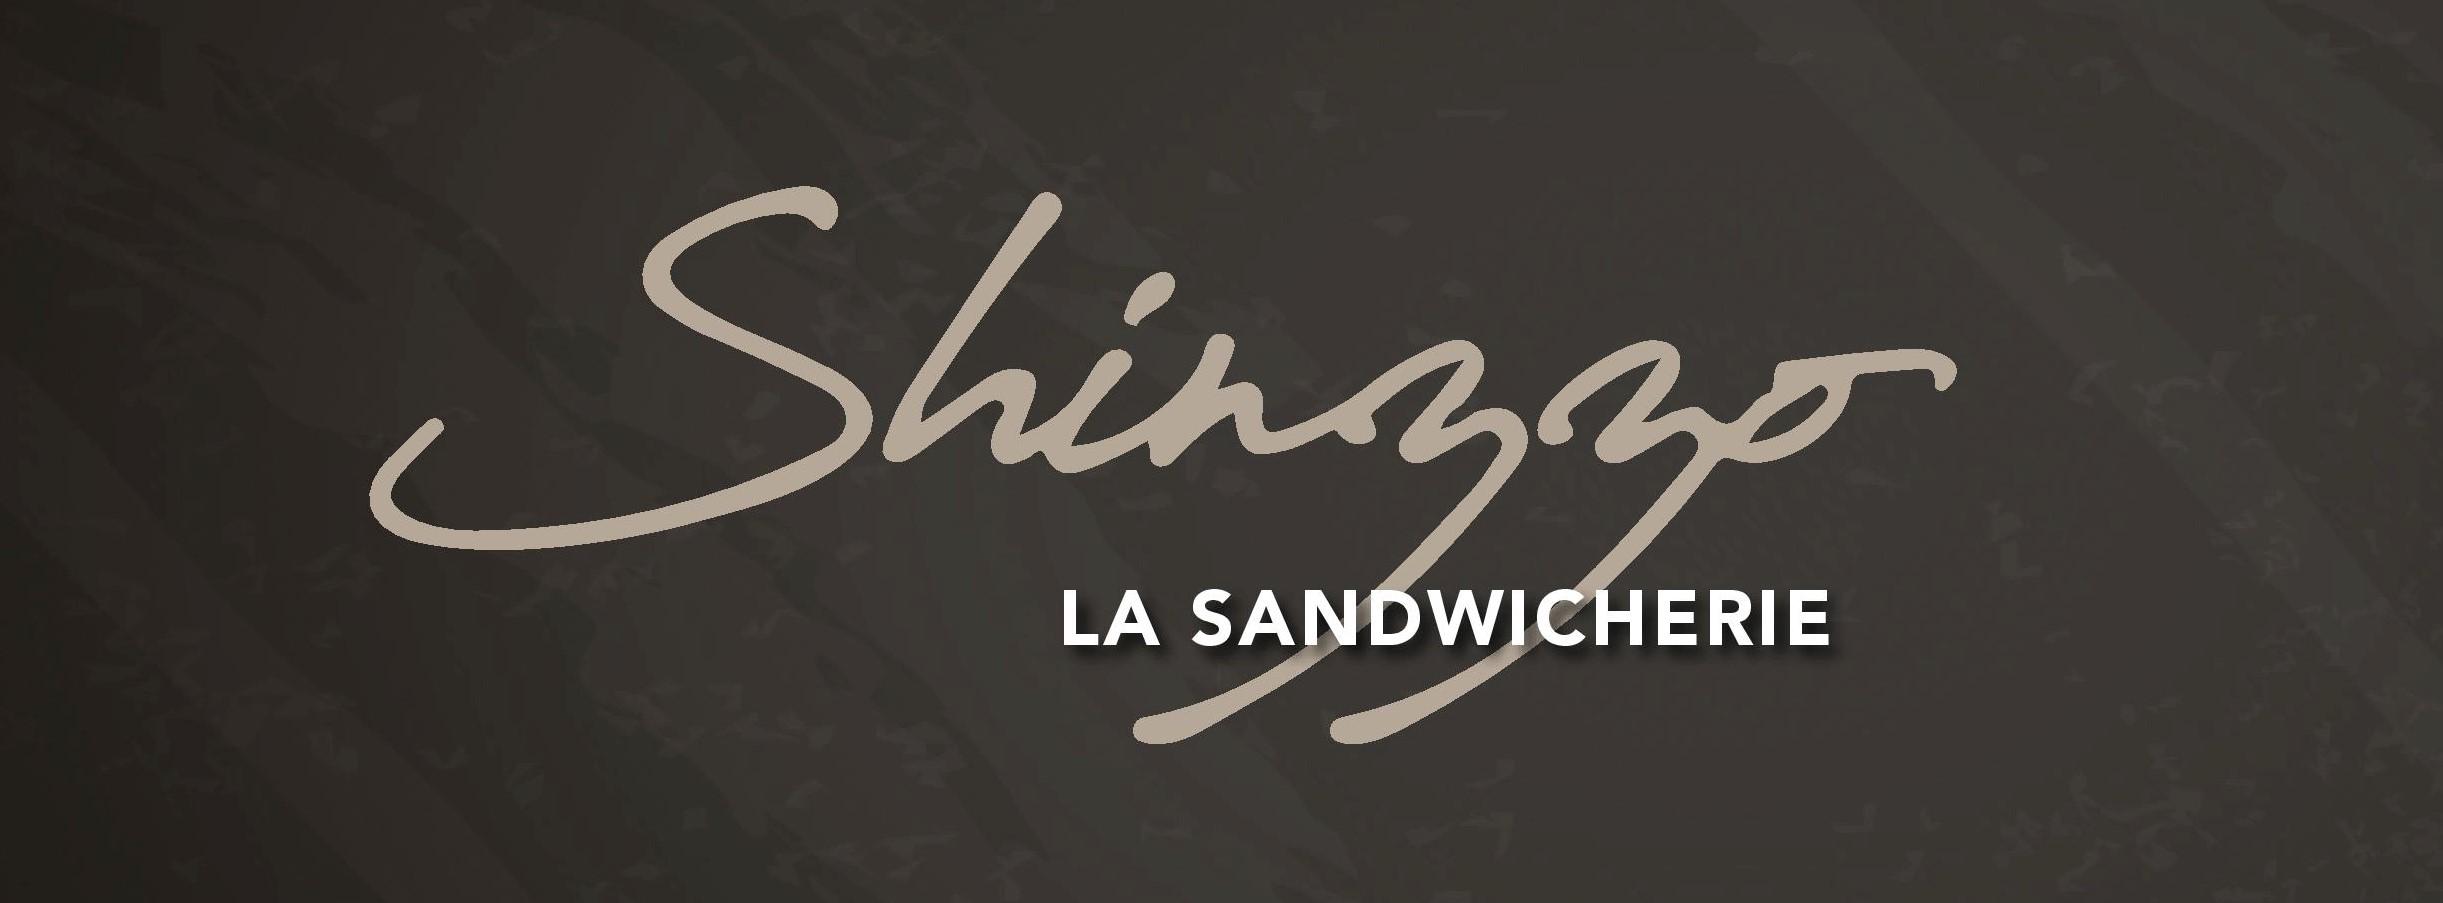 Shinzzo Sandwicherie